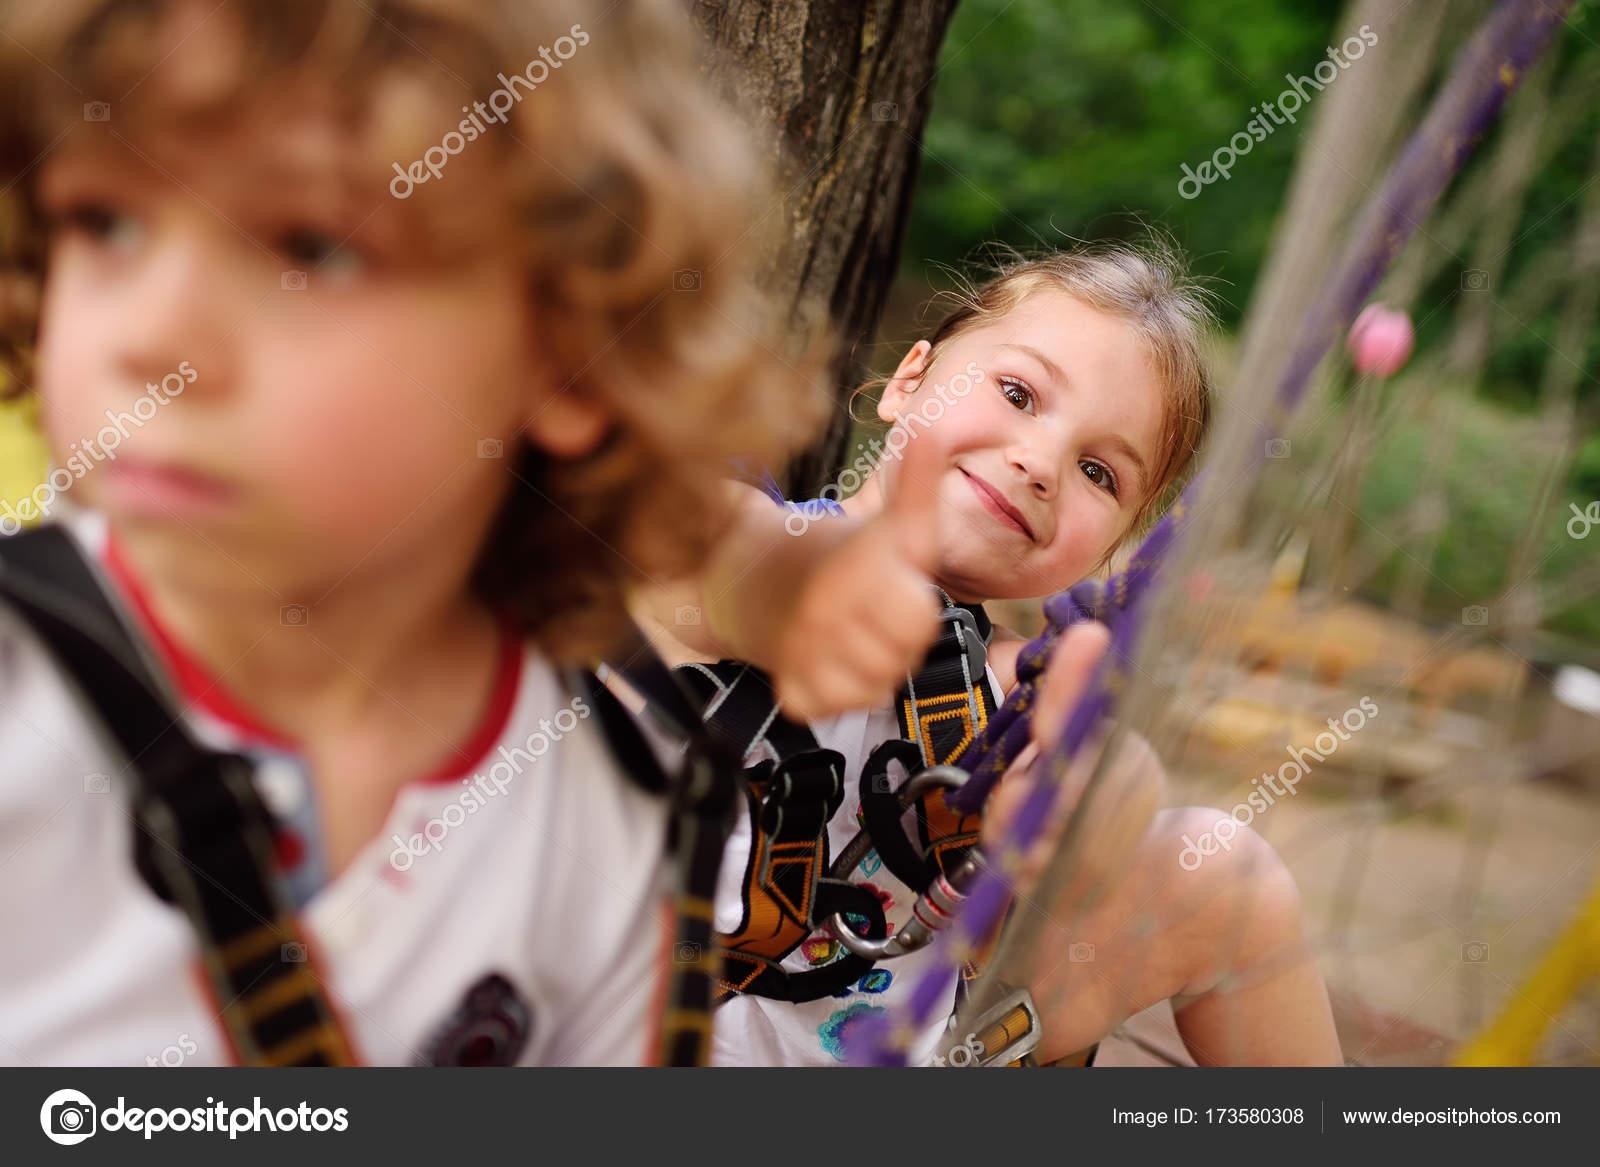 d257ed81fa5 τα παιδιά - ένα αγόρι και ένα κορίτσι στο πάρκο σχοινί περάσει ...